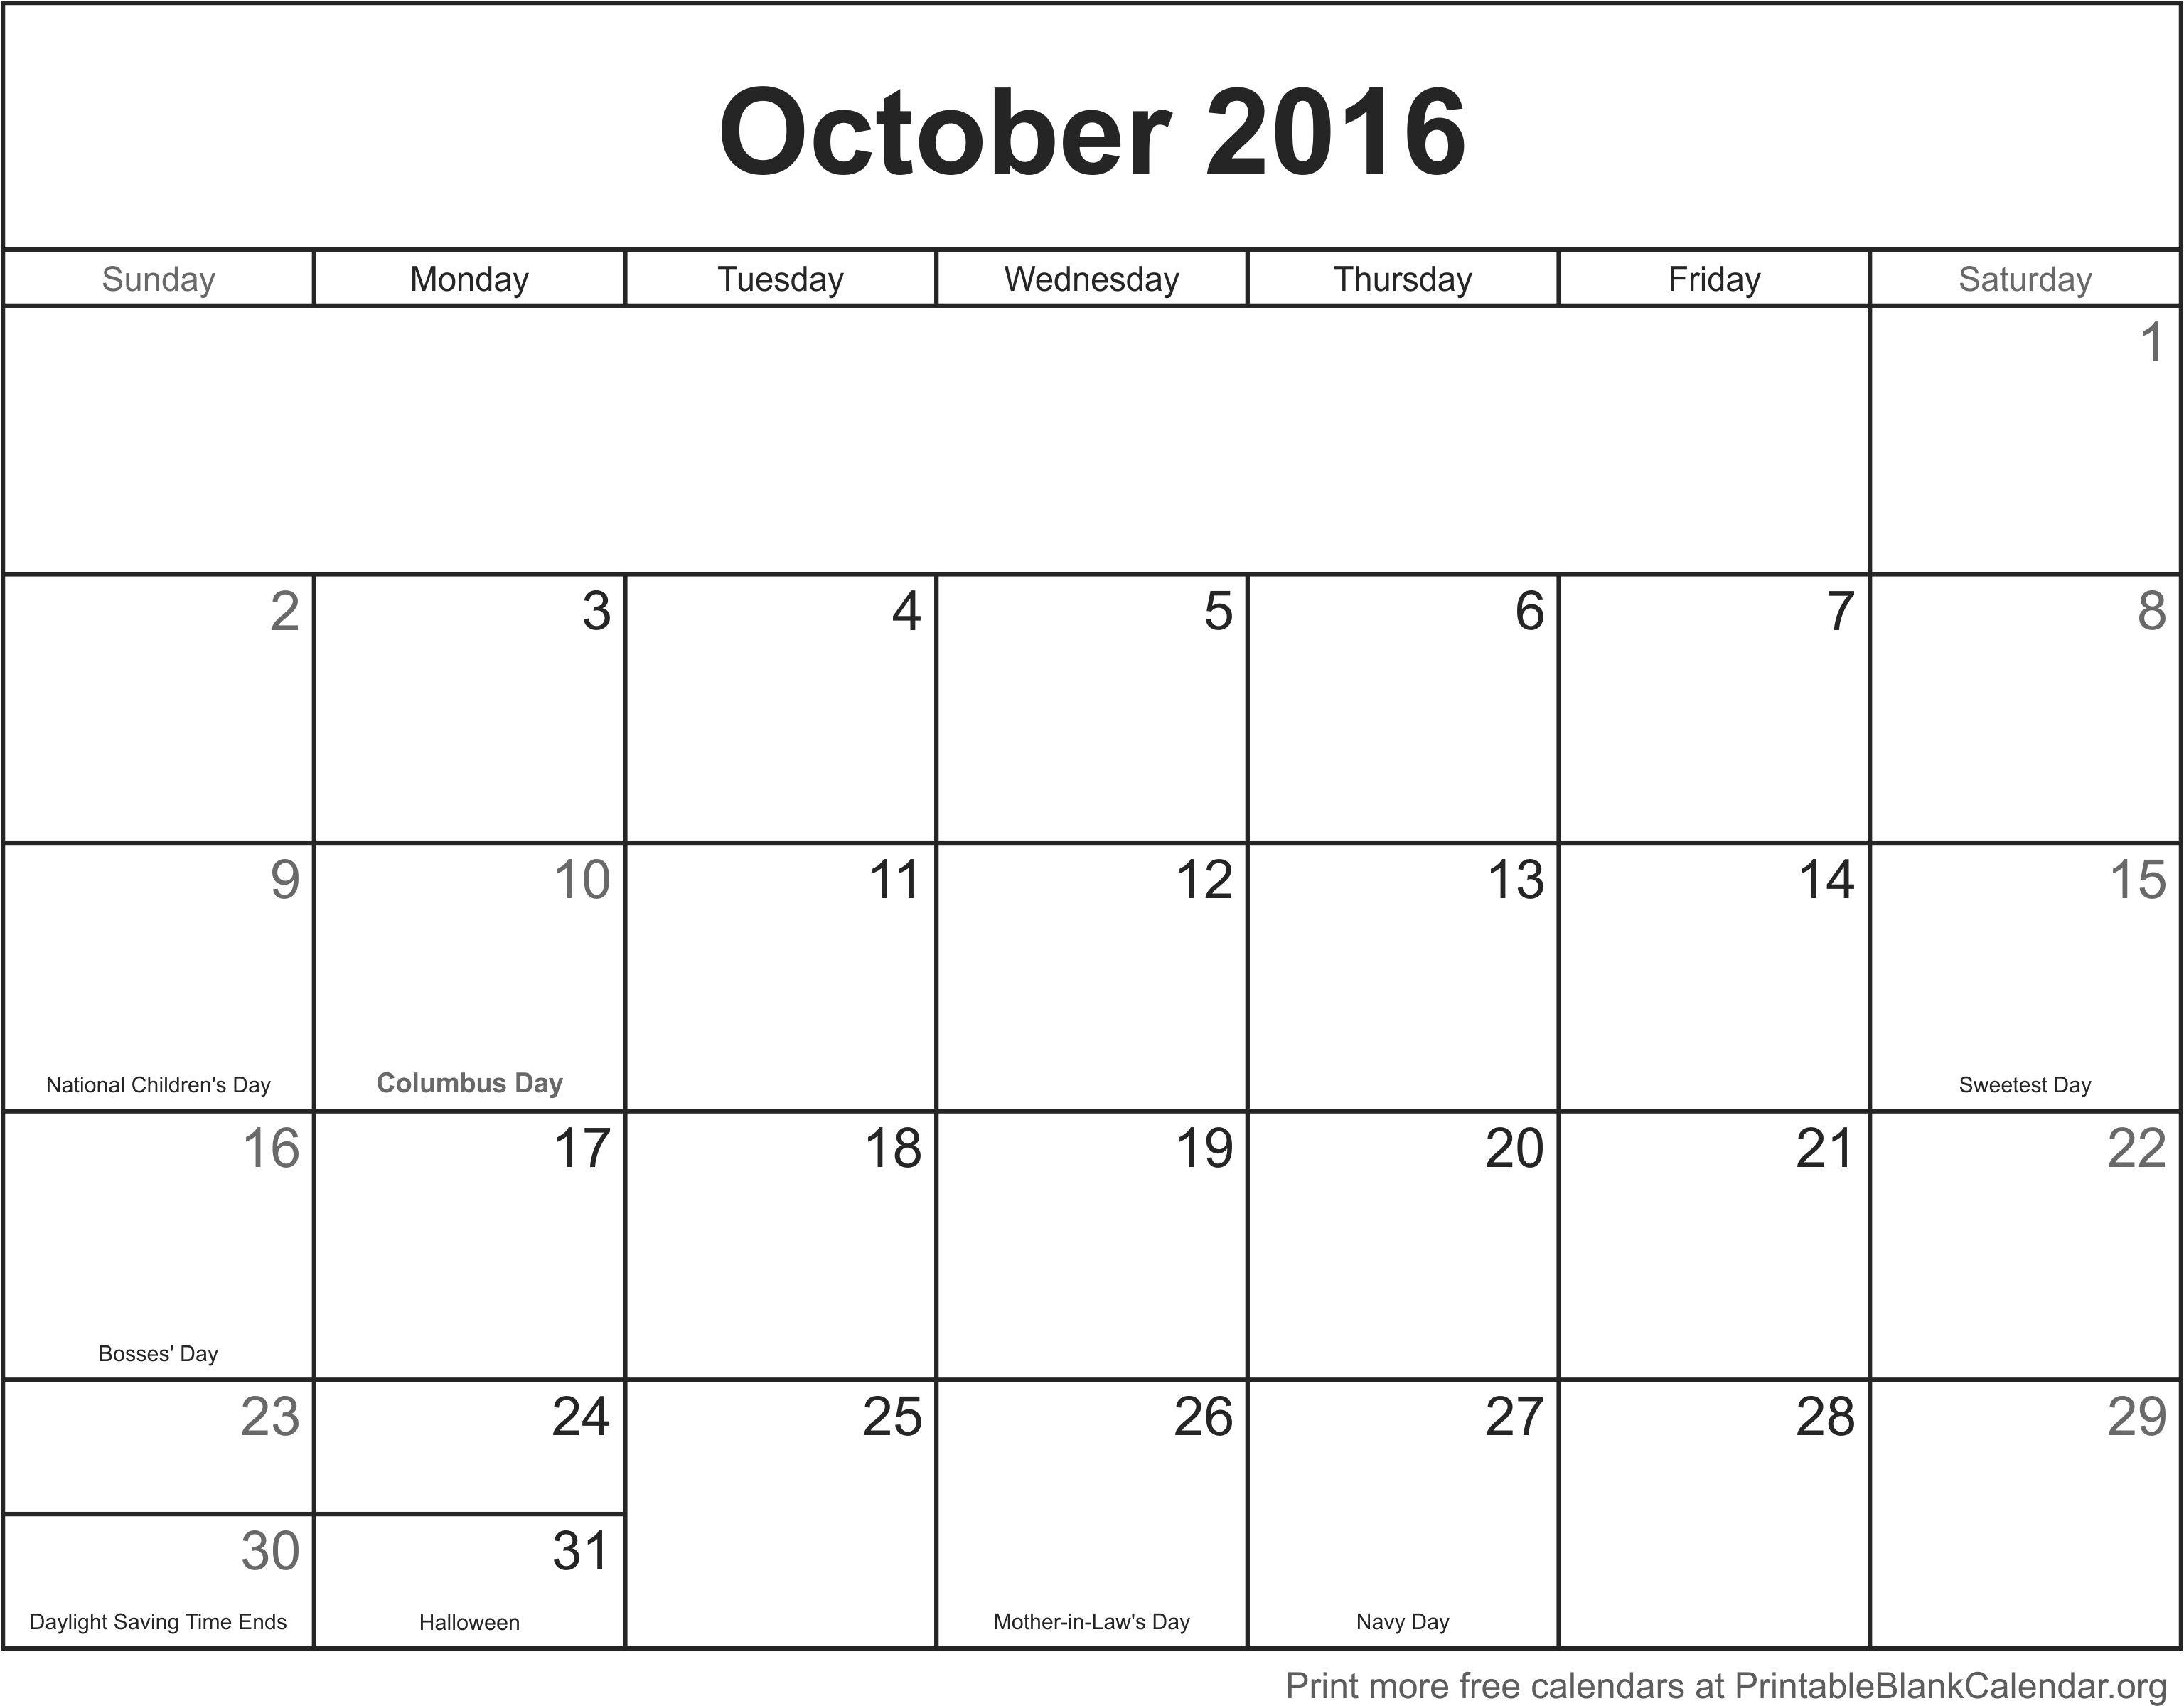 October 2016 Printable Blank Calendar